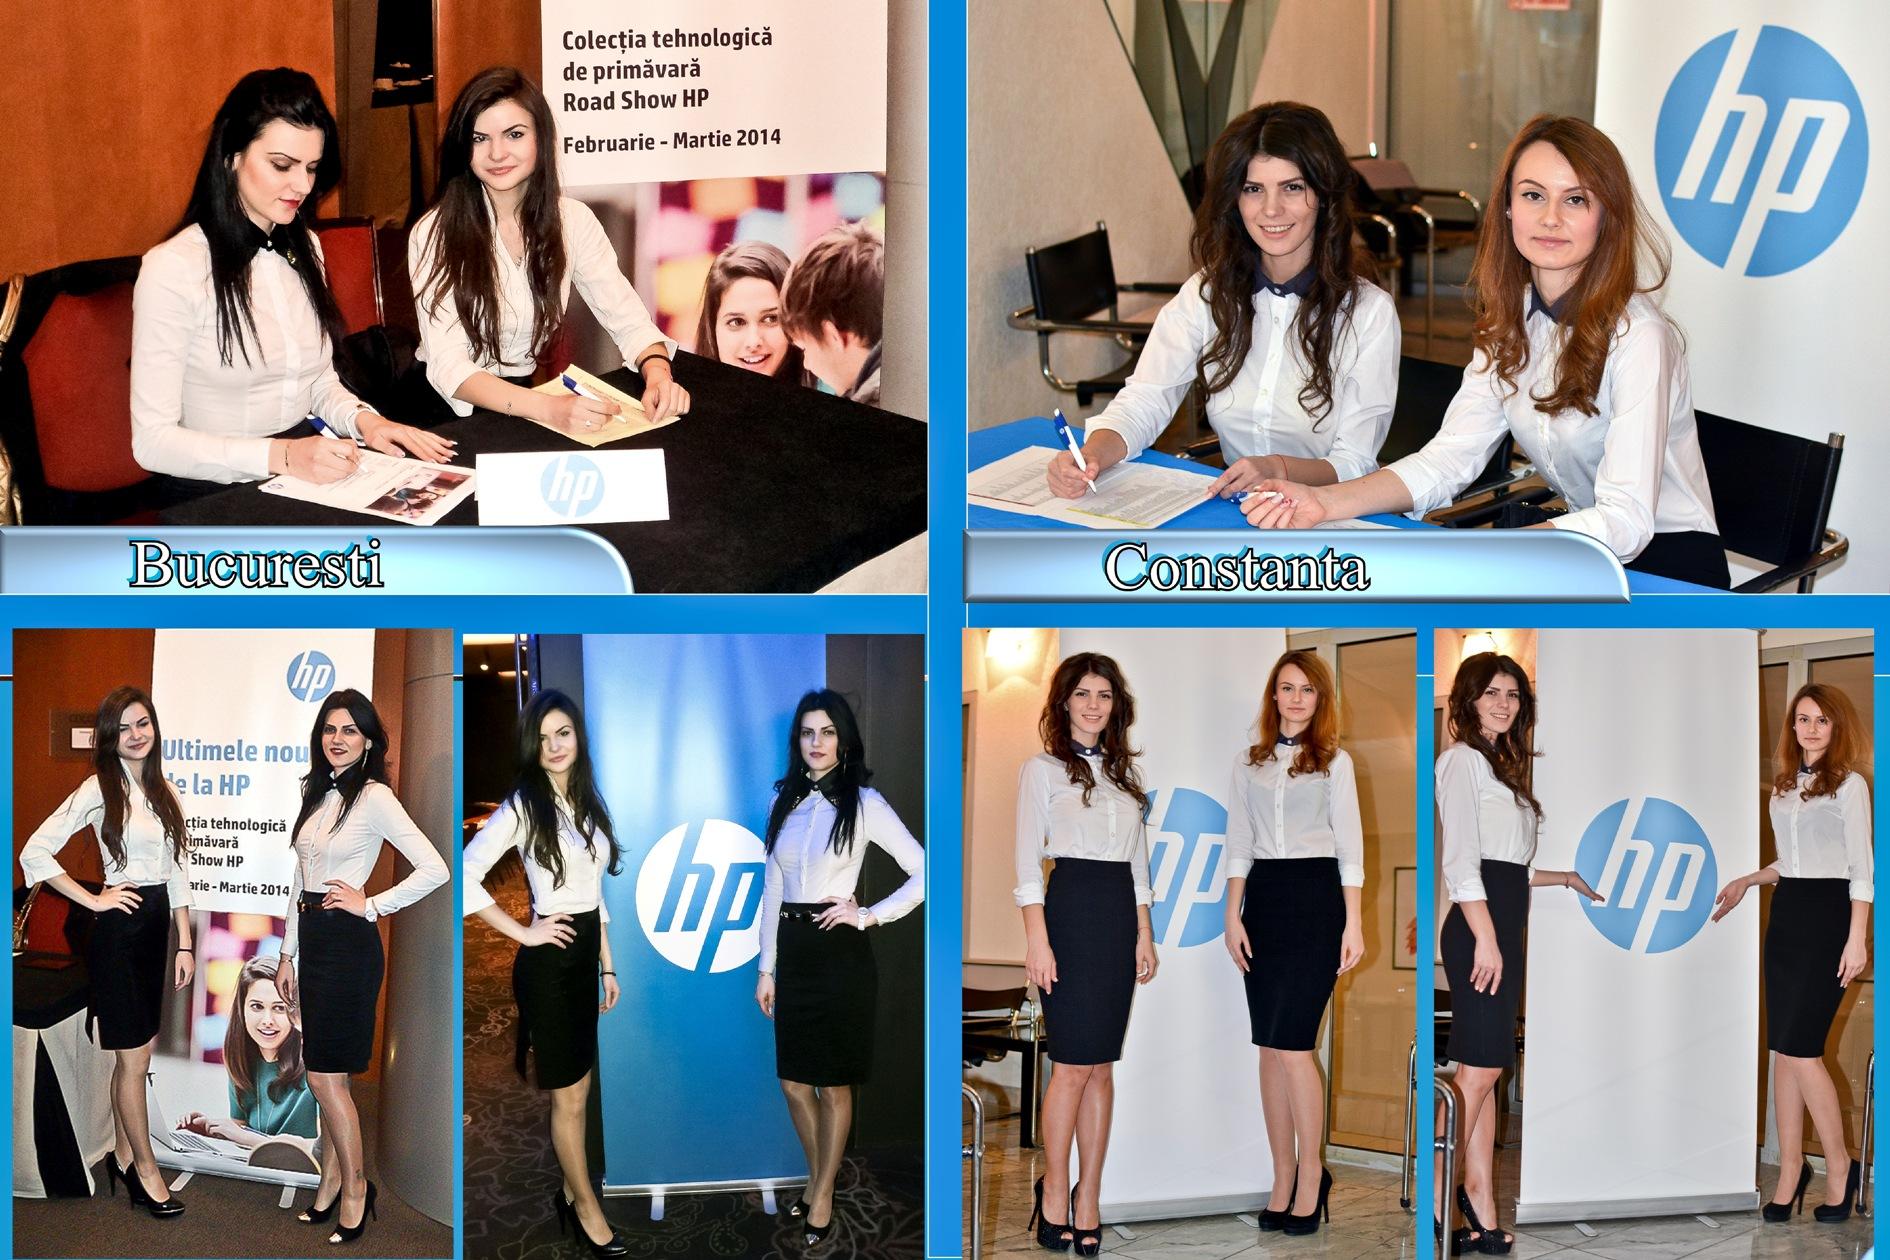 Hostess+Bucuresti,Constanta.JPG